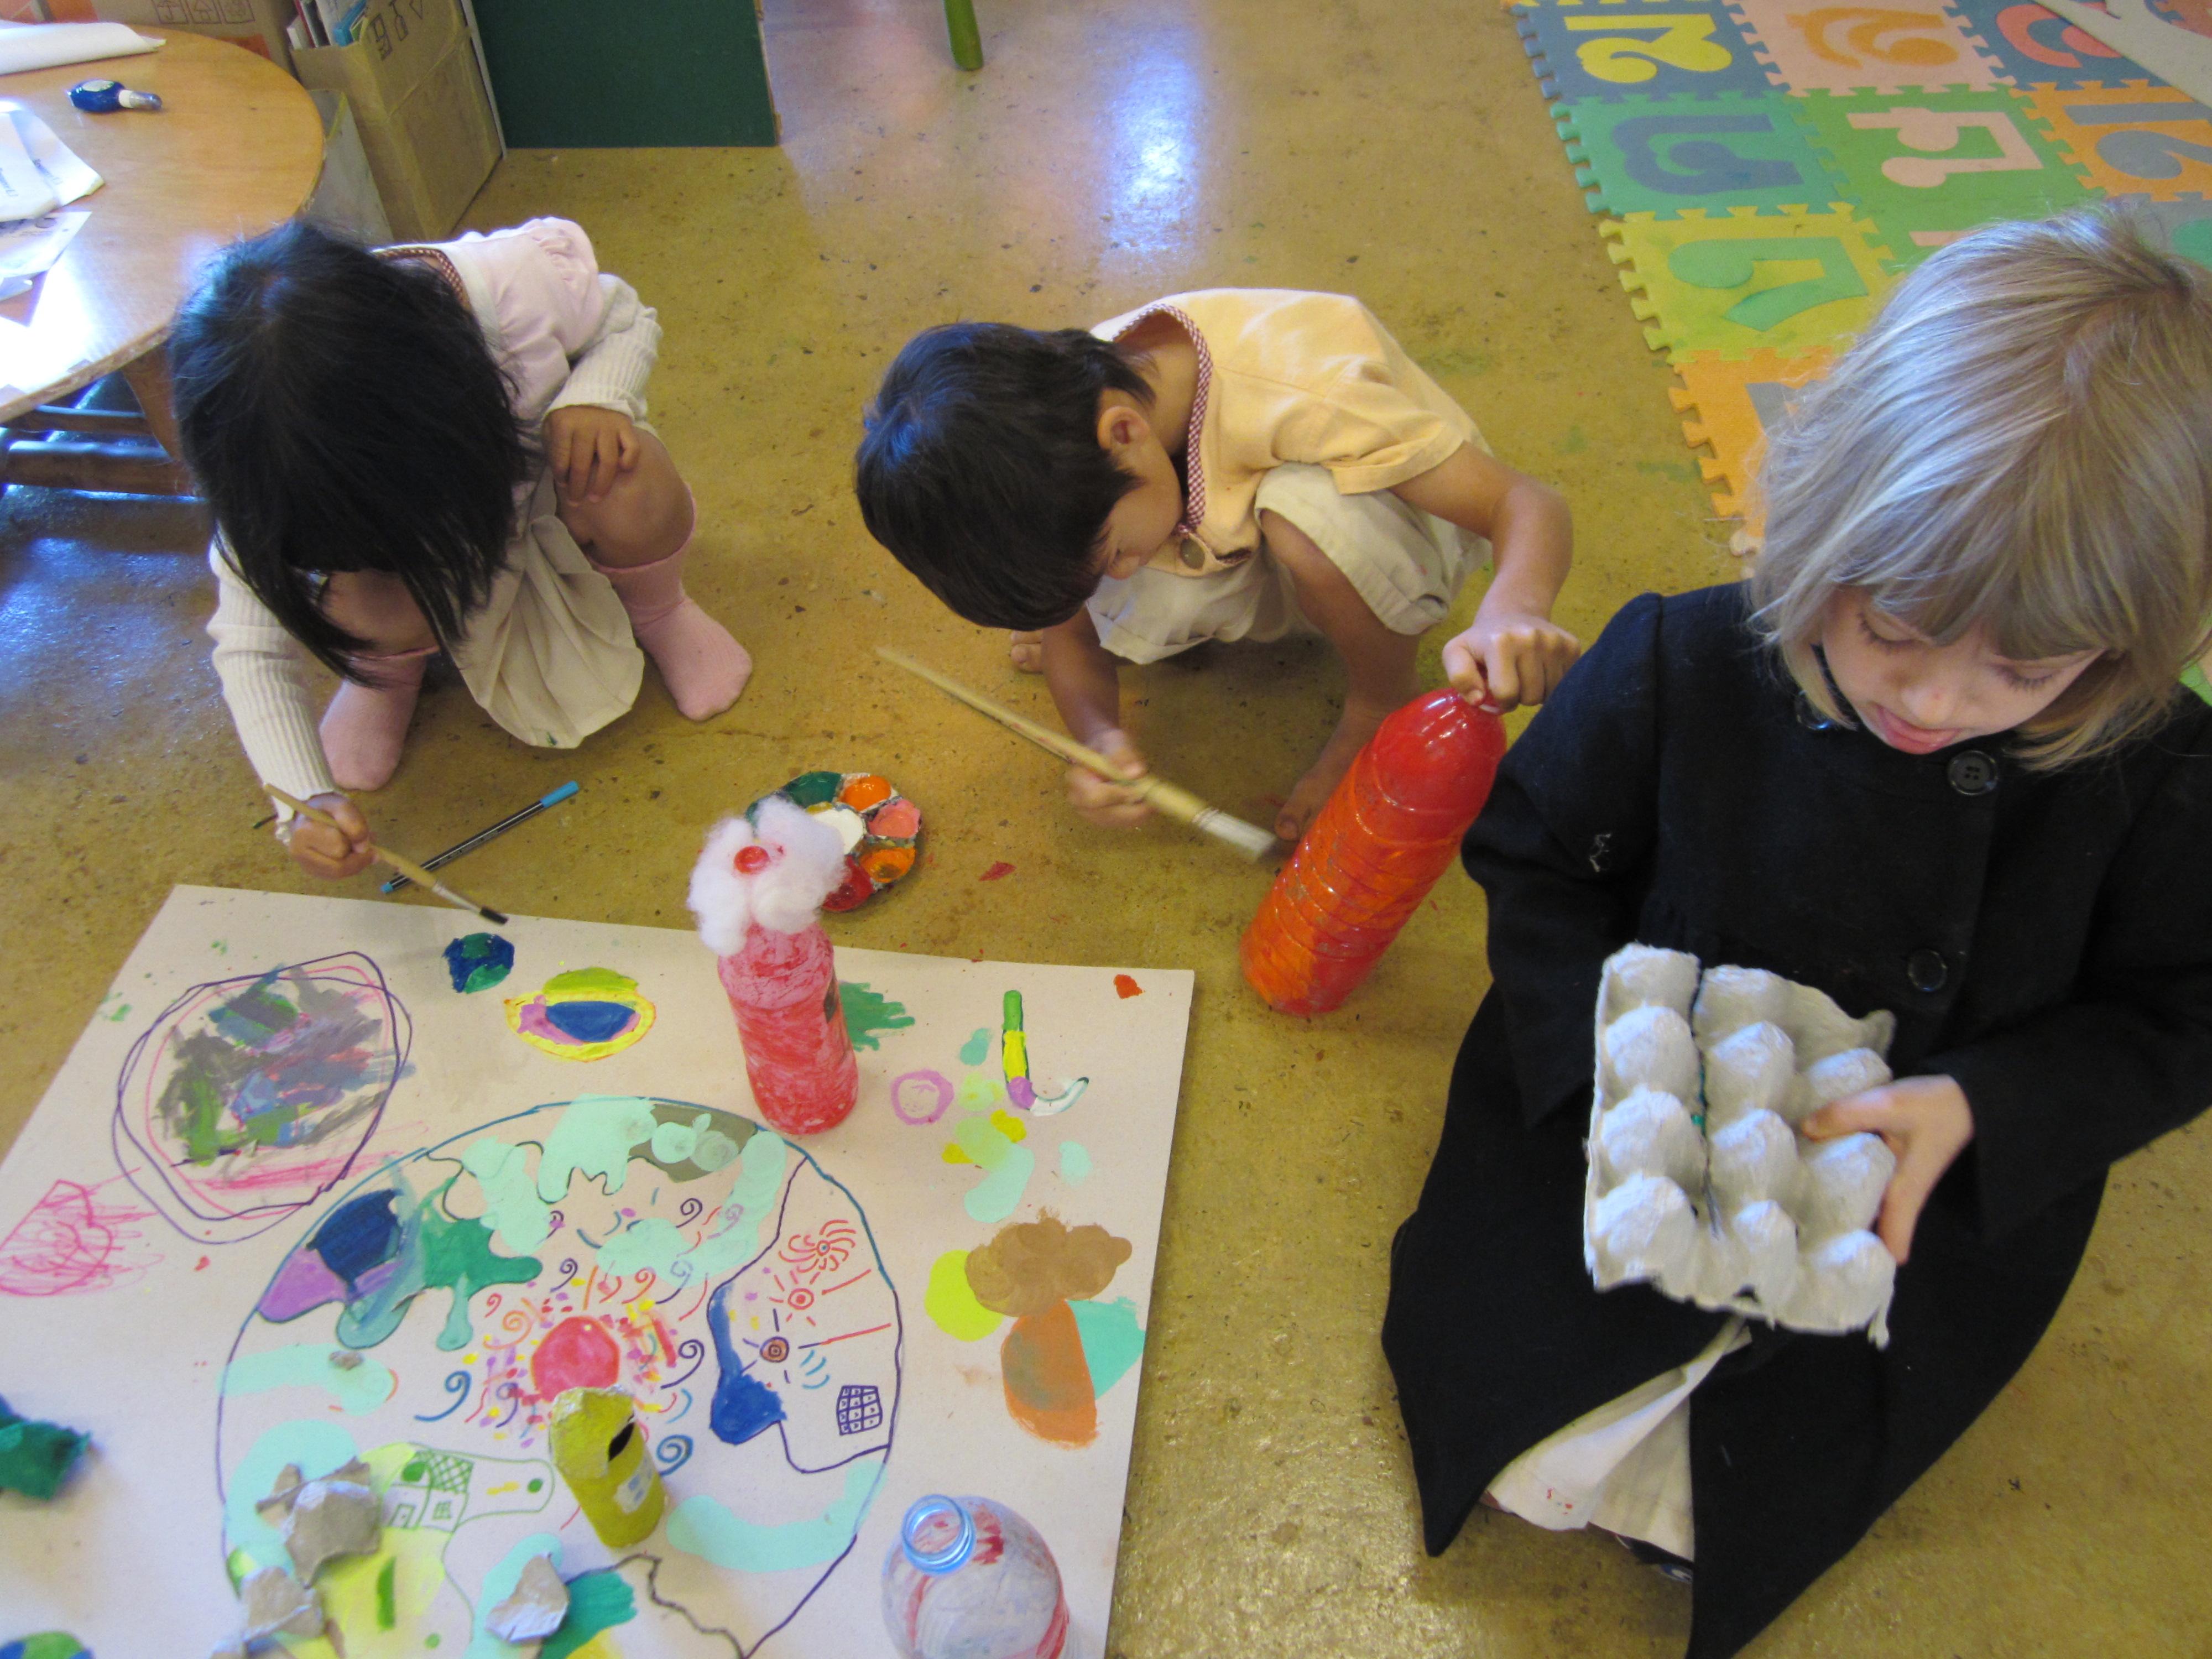 Kindergarten students making art with recycled materials at Panyaden School, international school in Chiang Mai